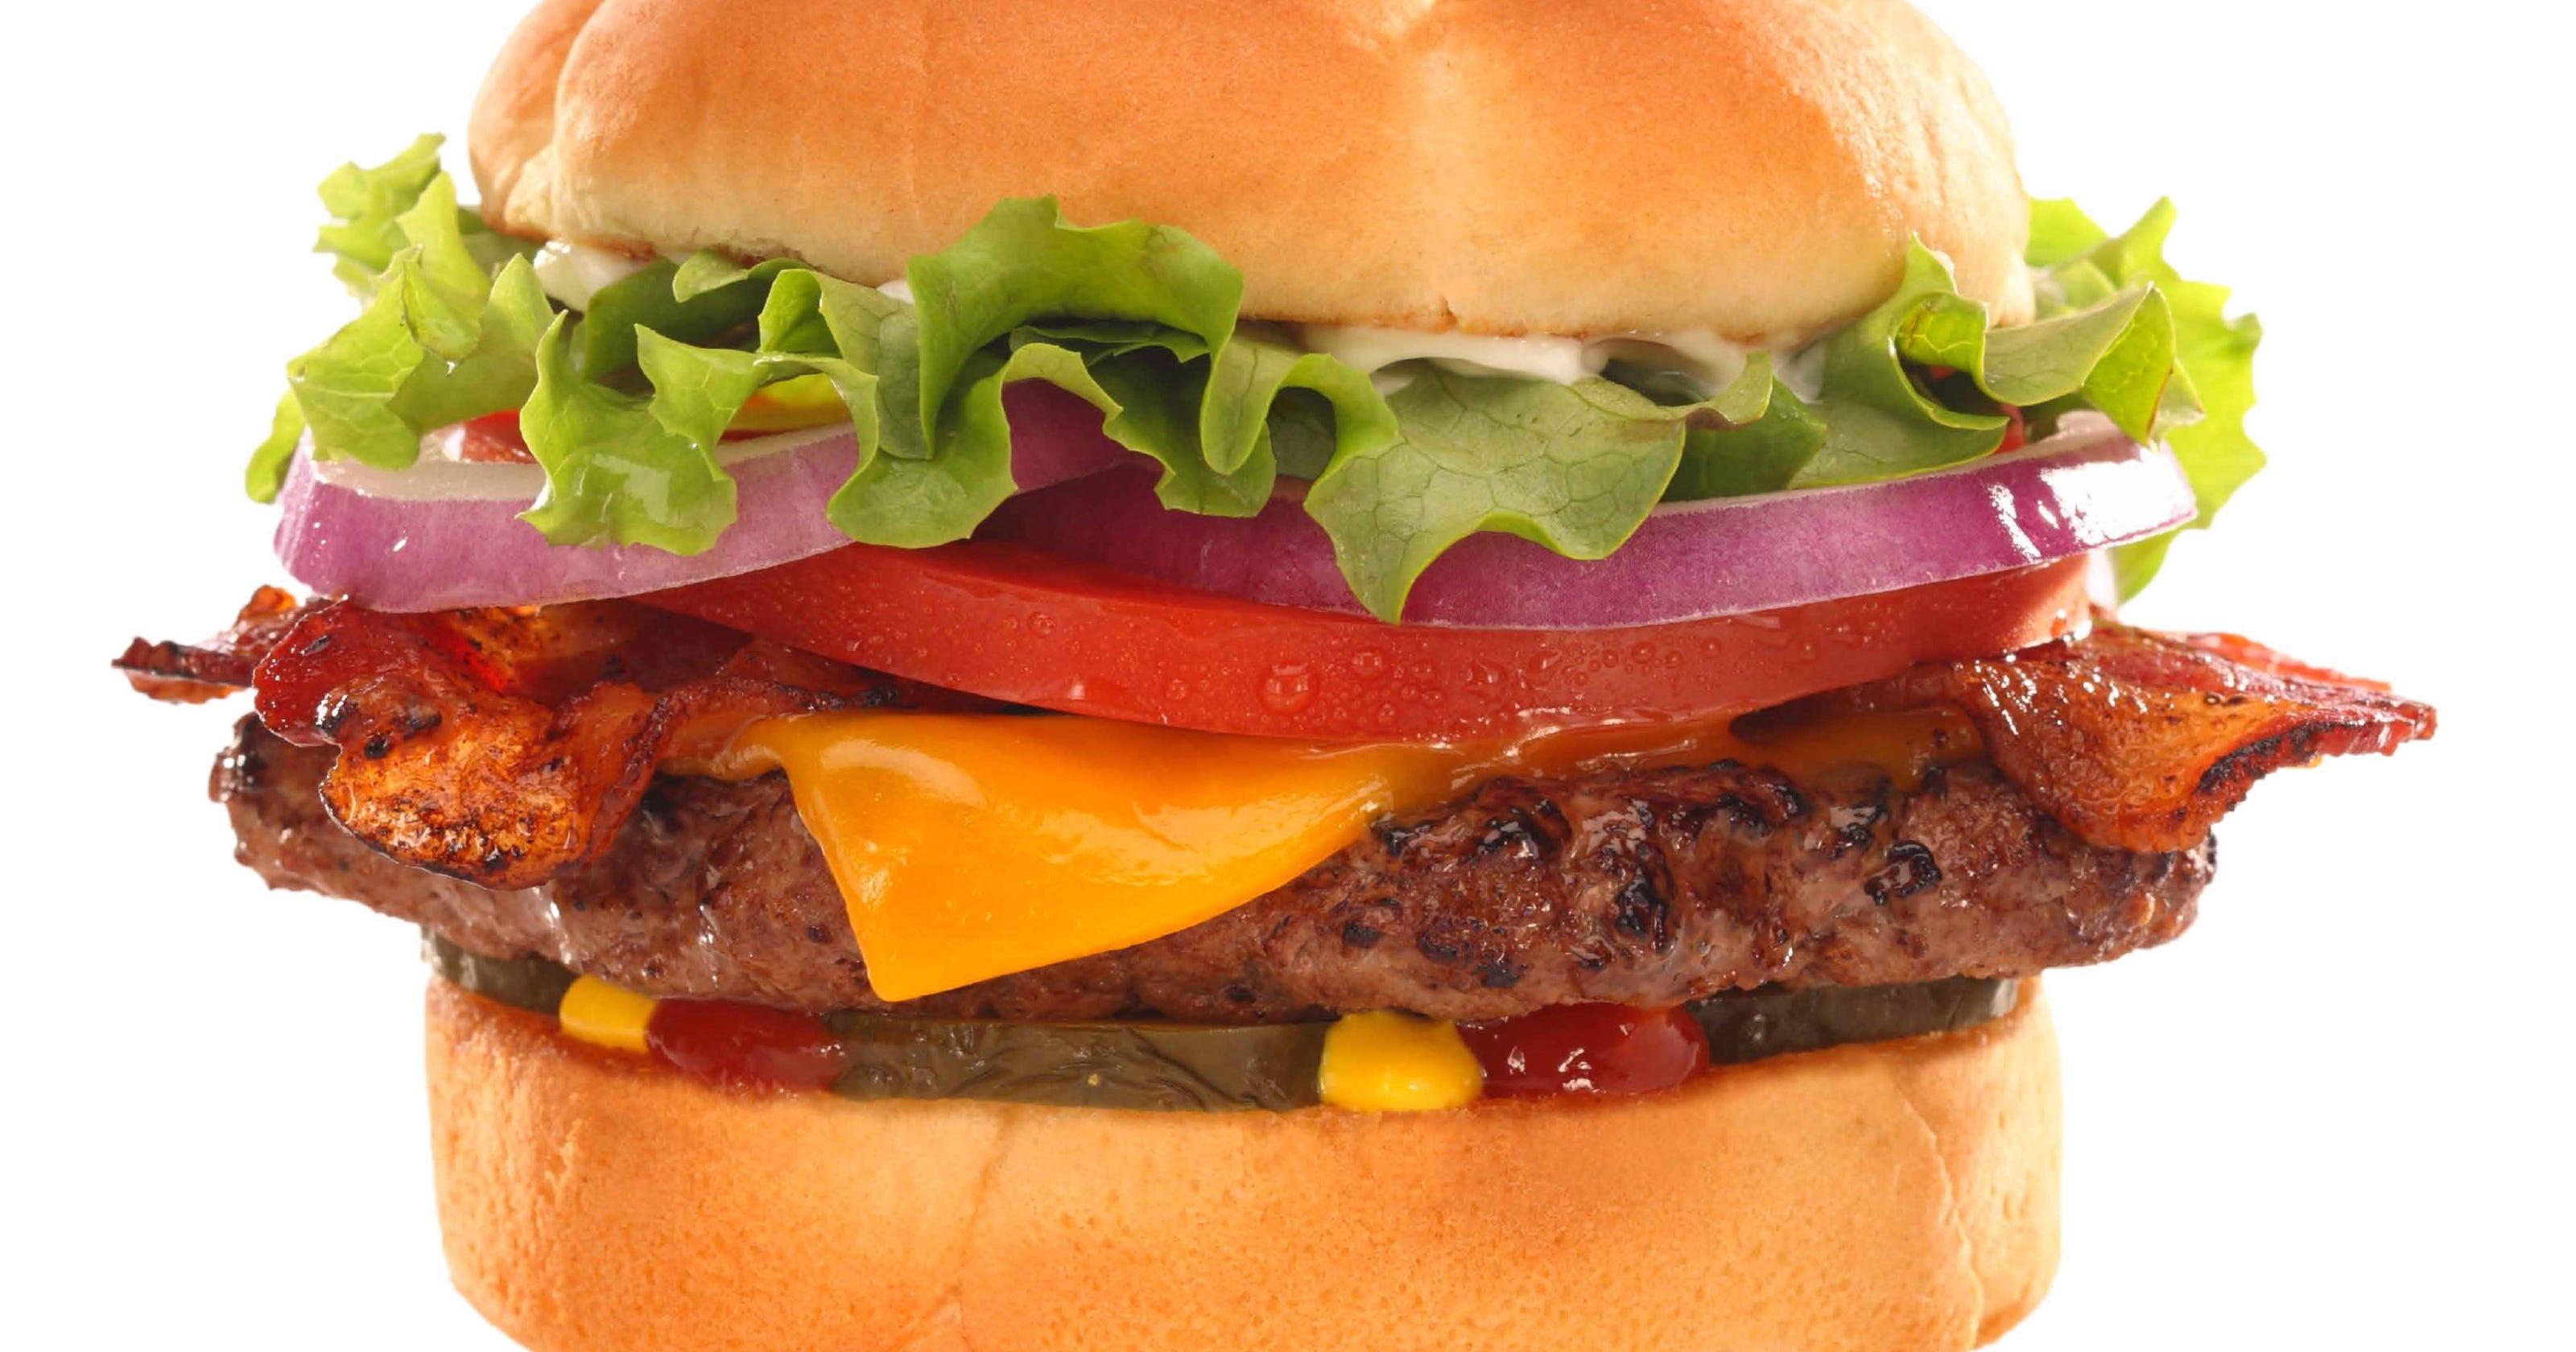 Backyard Burger Feedback back yard burgers plans move into downtown nashville